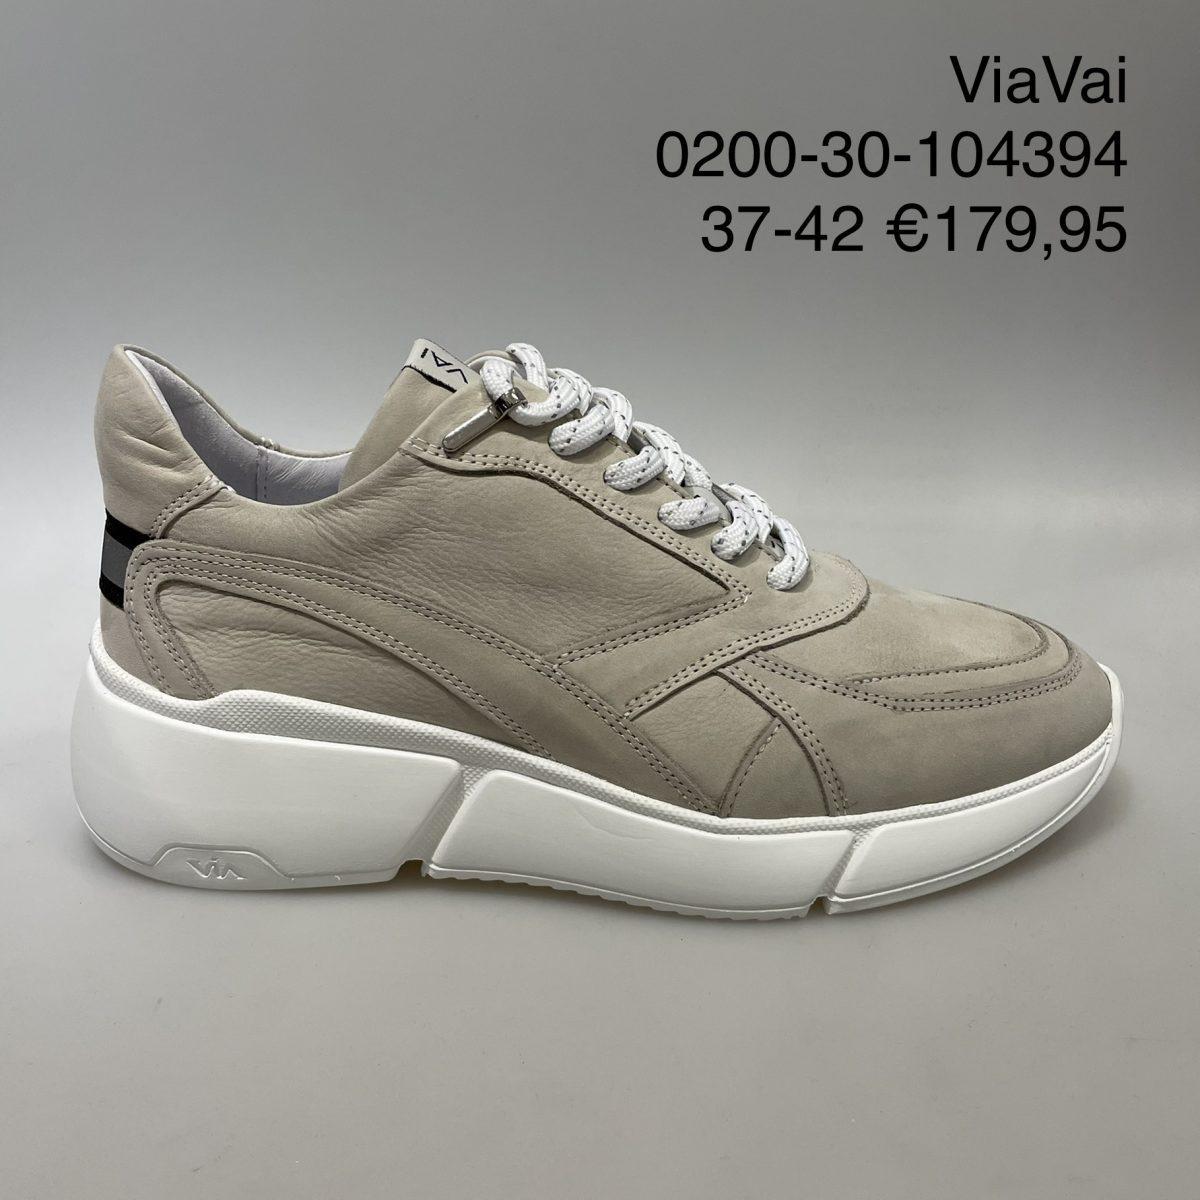 Dames Schoenen 6